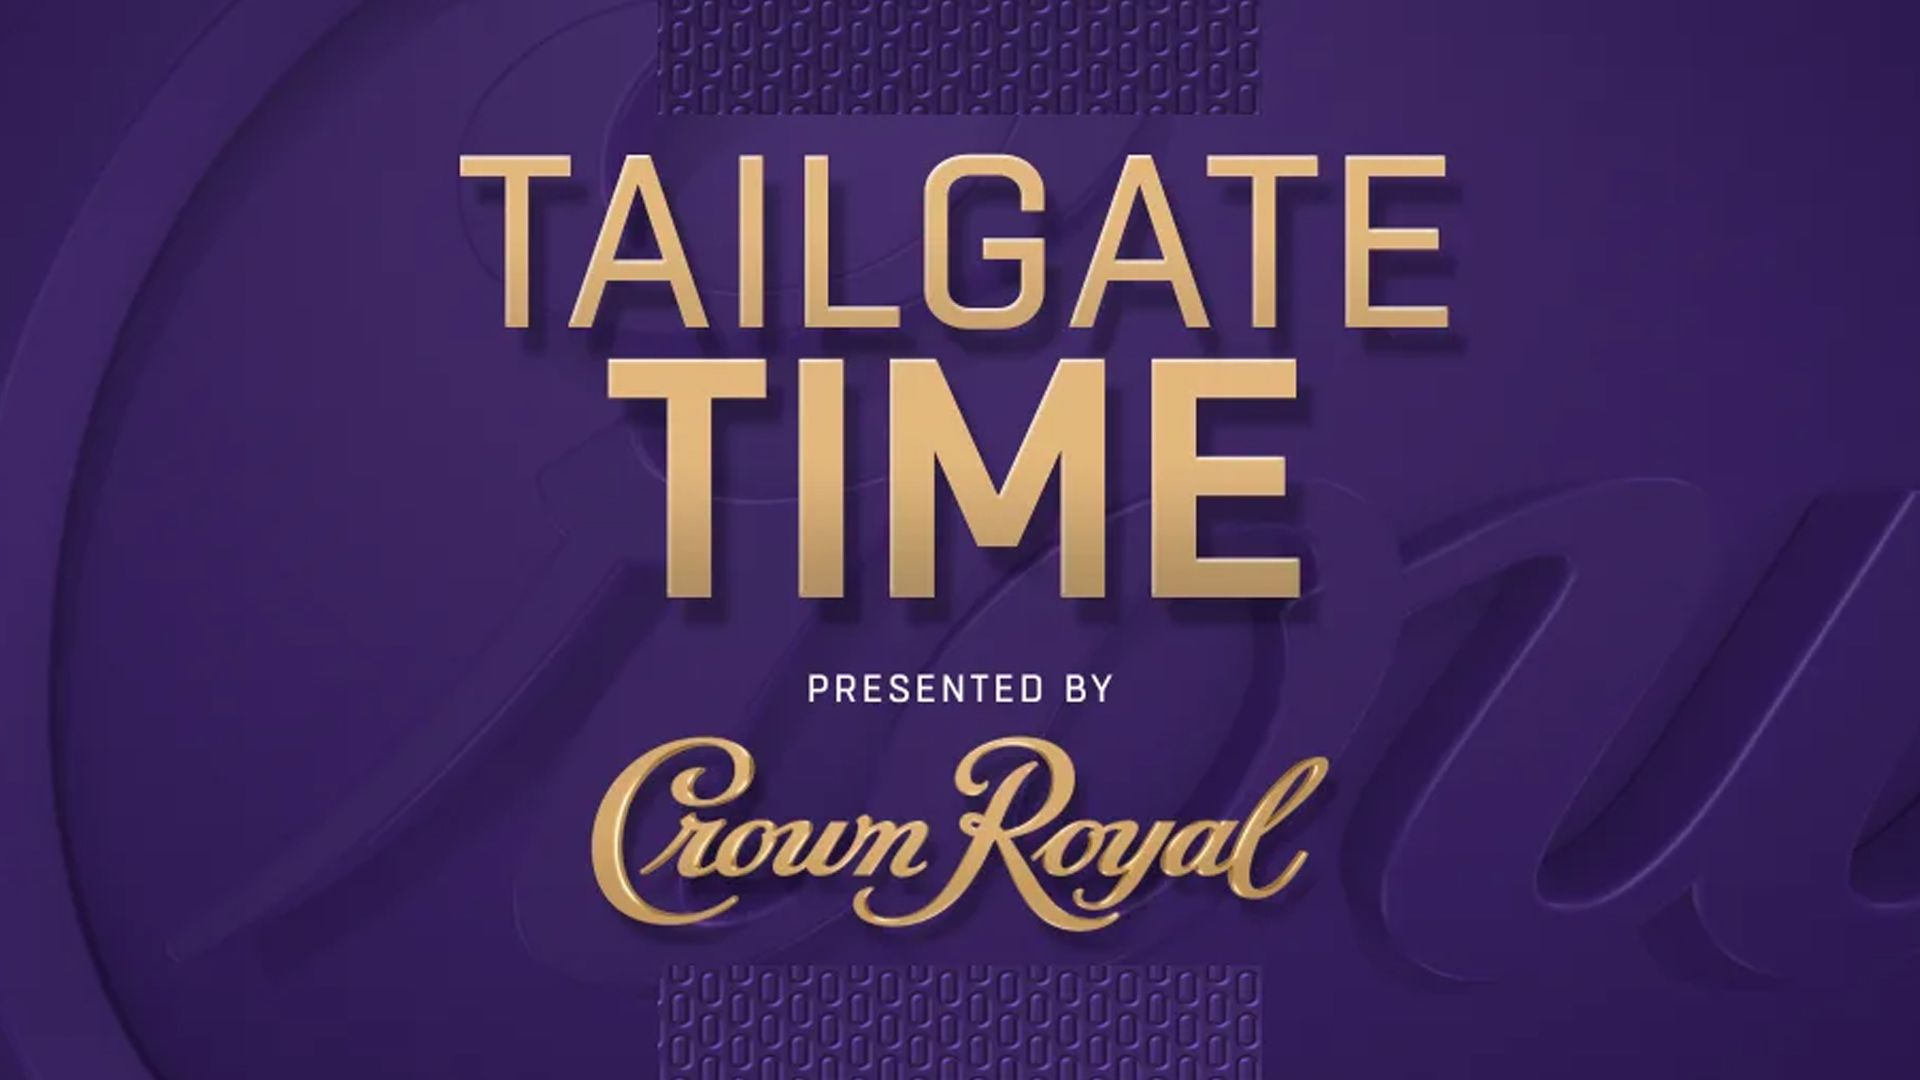 Crown Royal Tailgate Time